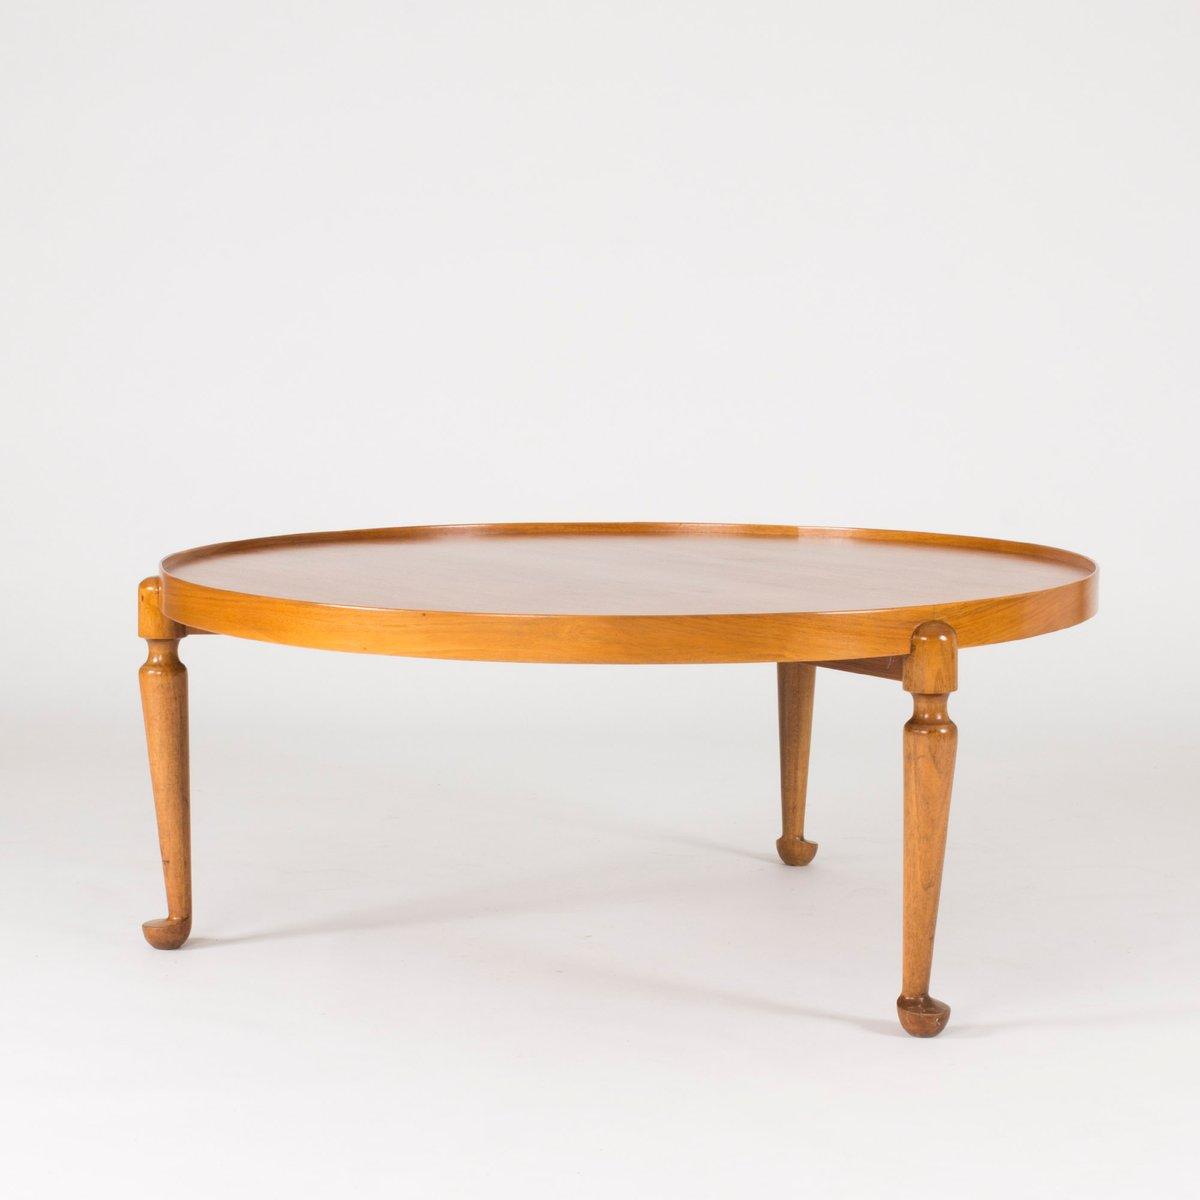 Mid Century Swedish Round Walnut Coffee Table By Josef Frank For Svenskt Tenn